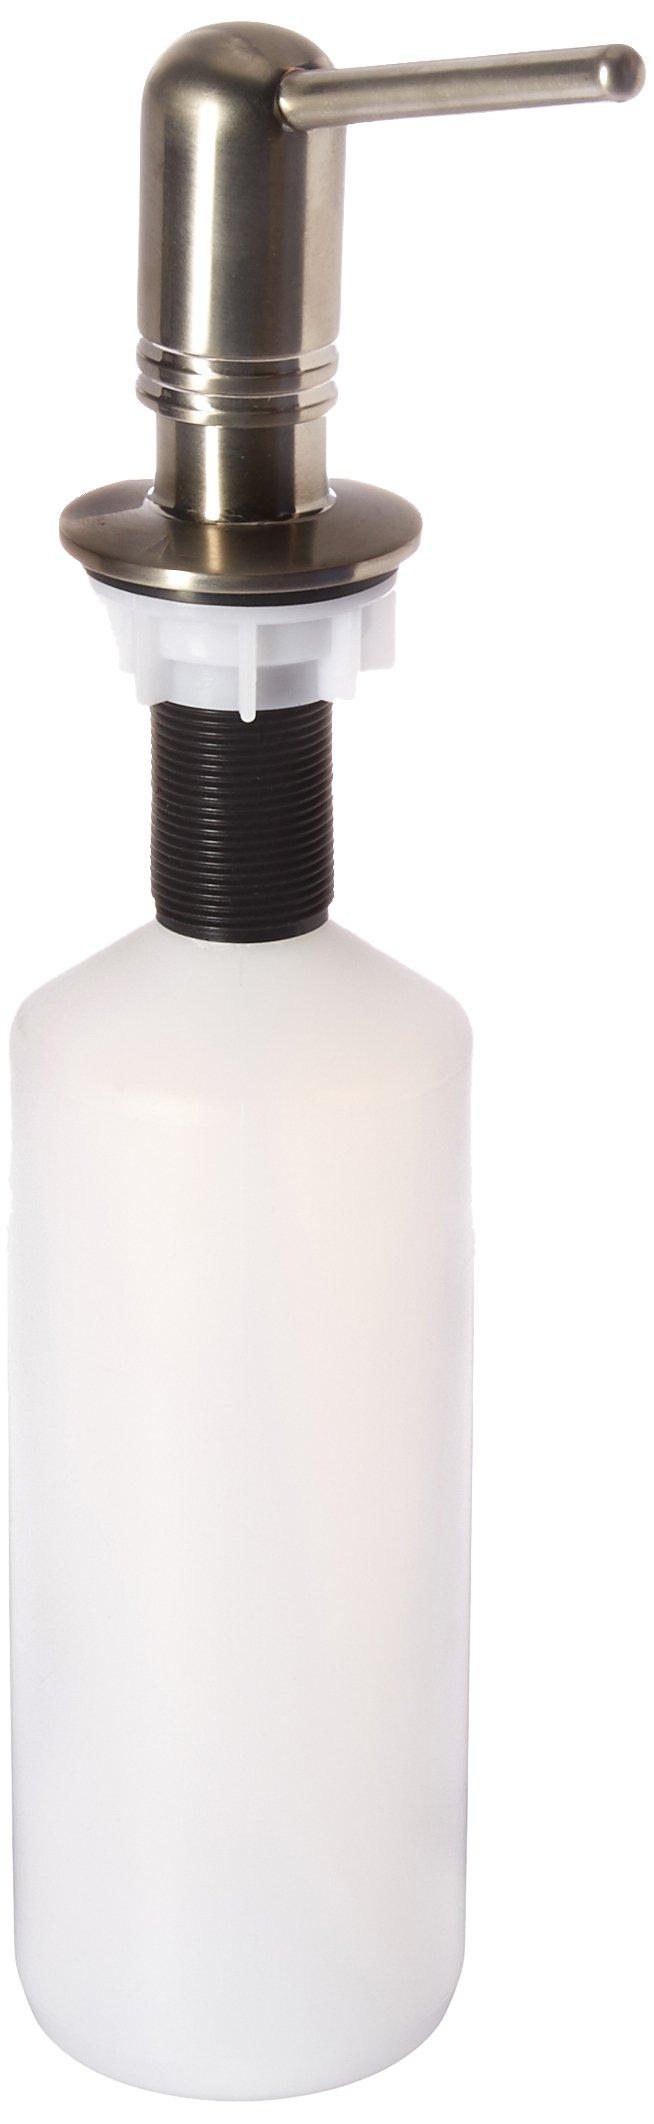 American Standard 4503.115.295 Deck Mount Liquid Soap Dispenser, Satin